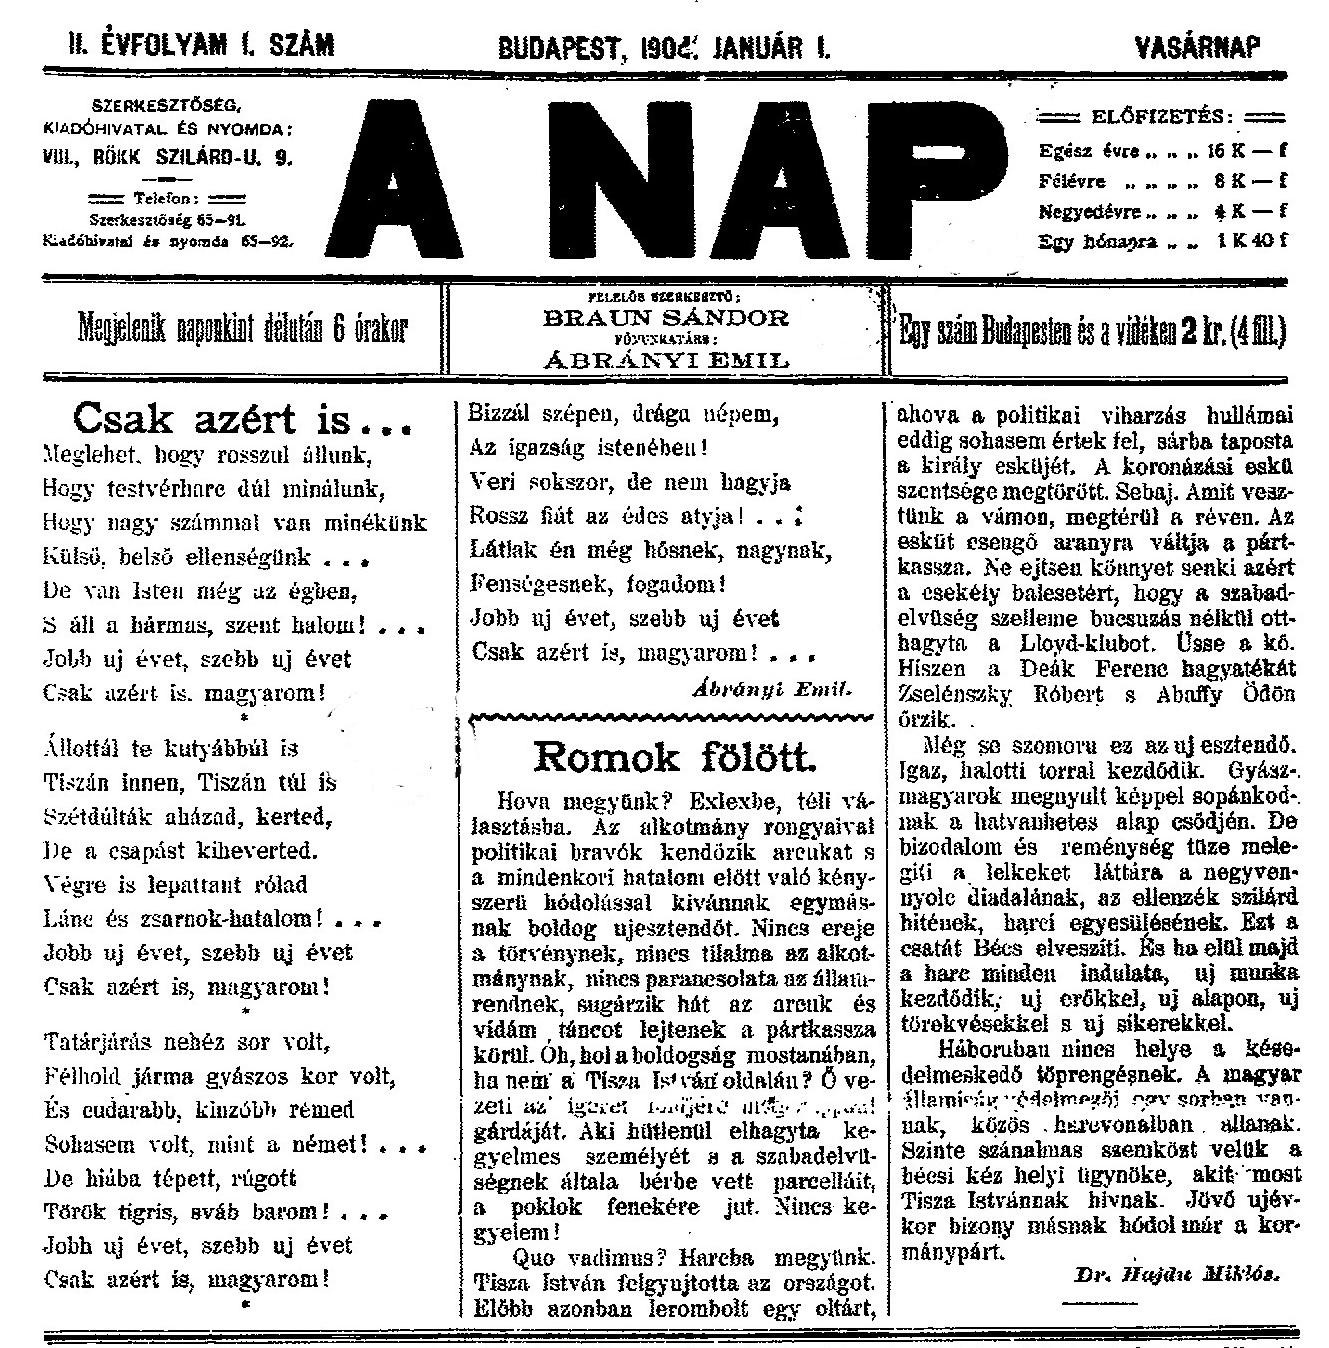 a_nap_verssel-kivagas.jpg